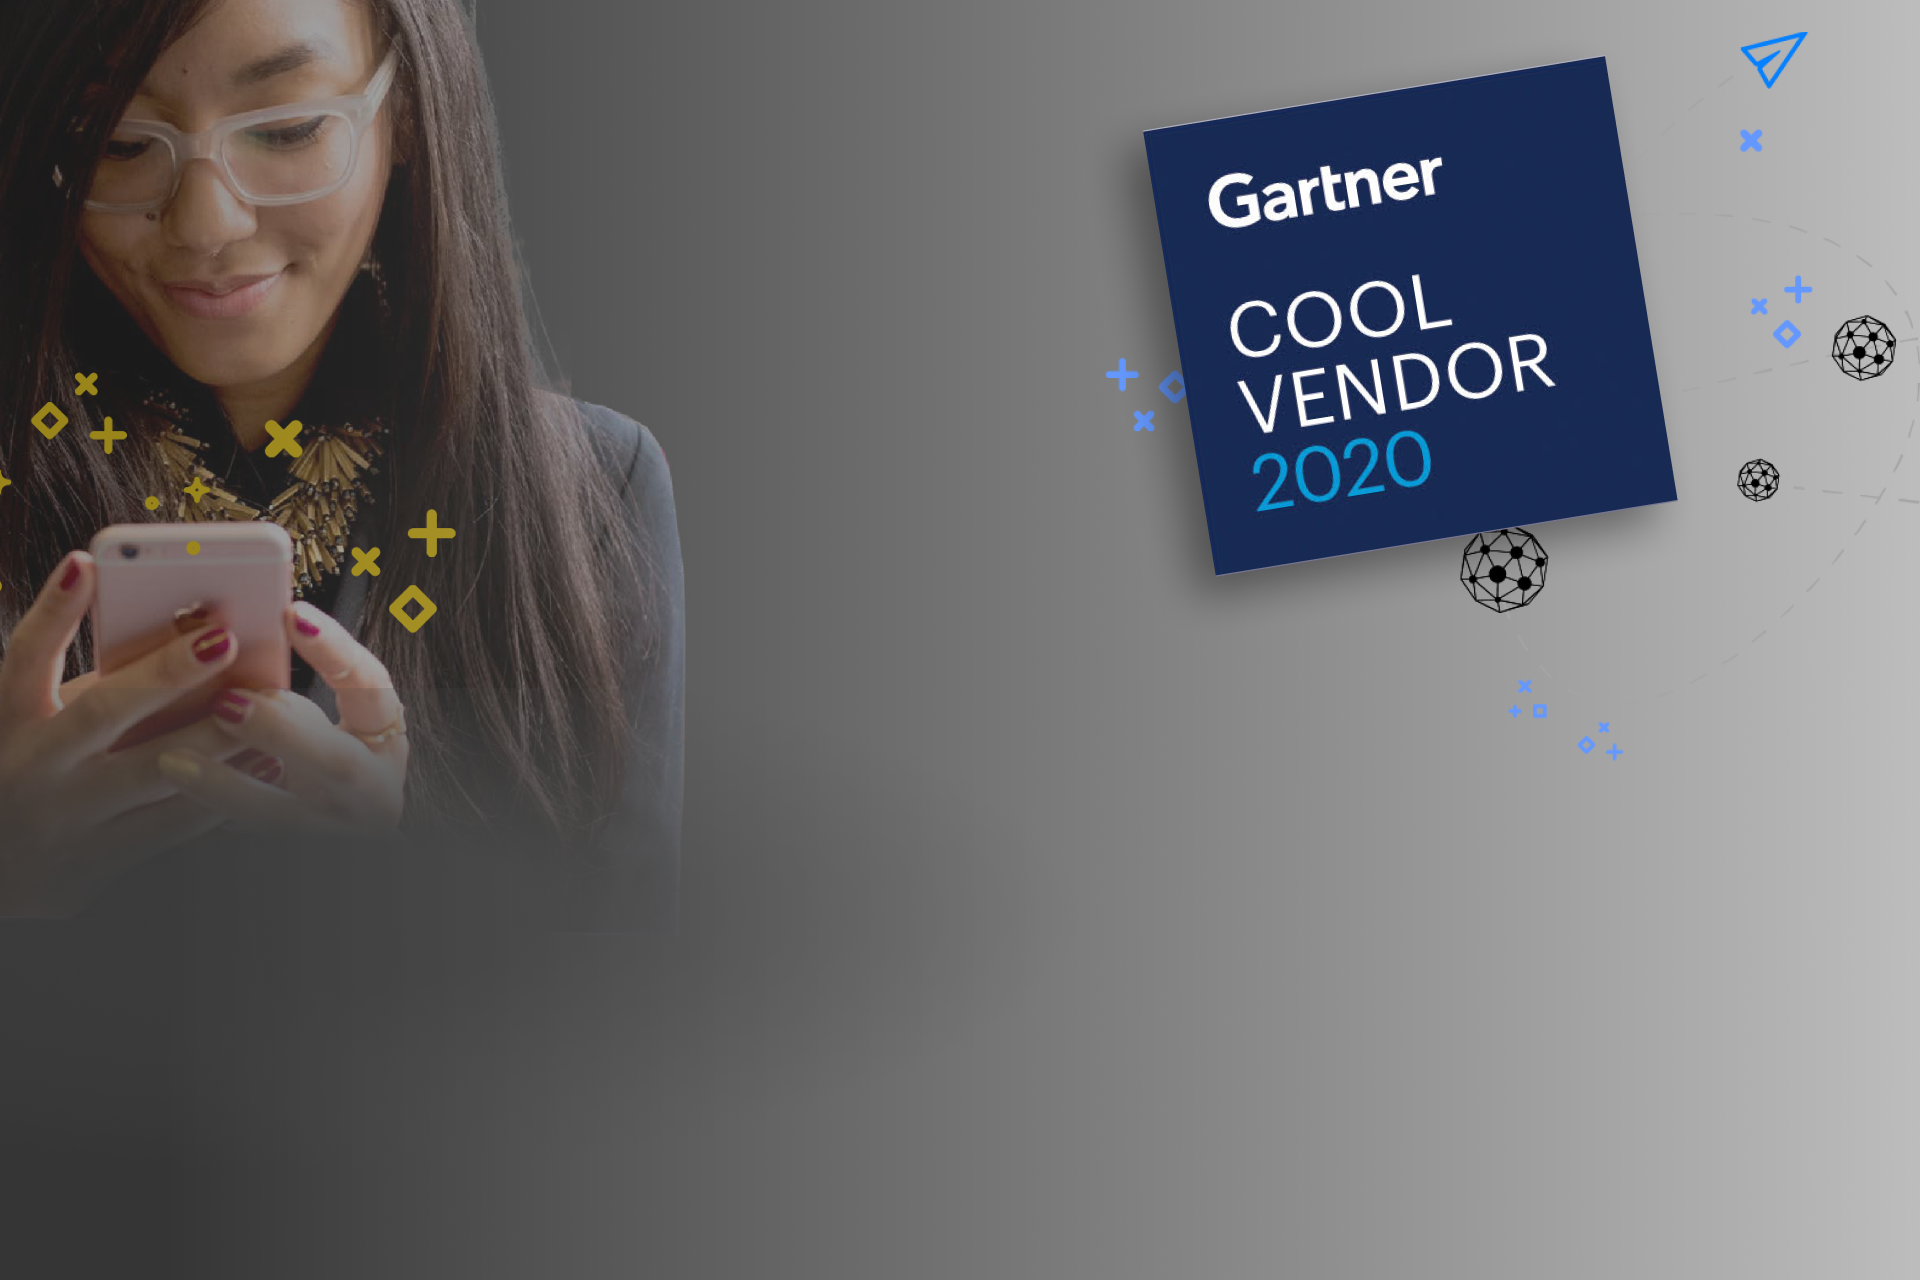 Gartner designated Roojoom as Cool Vendor!